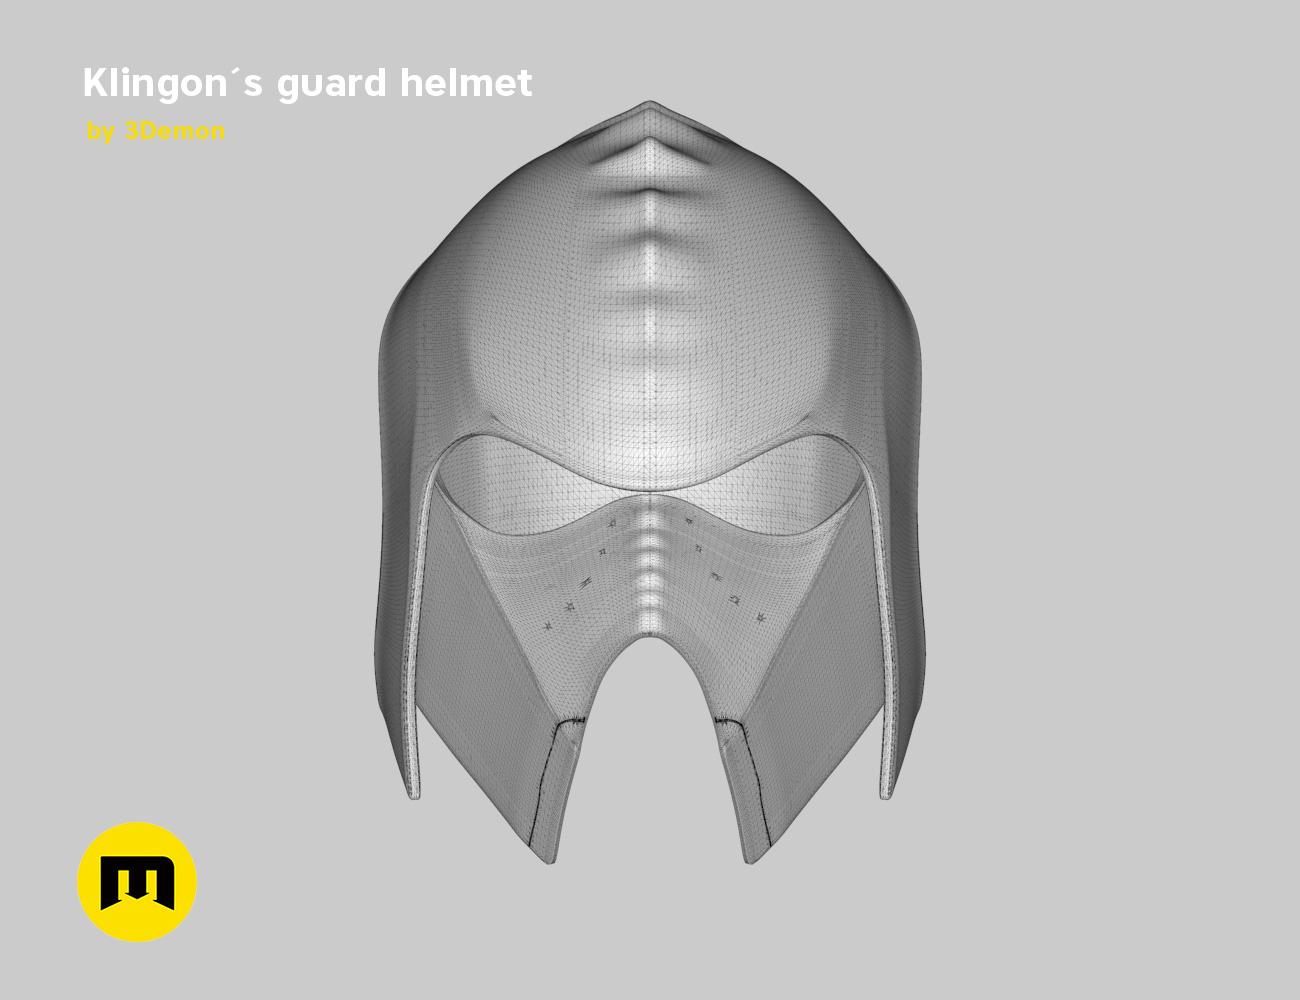 render_klingon_mesh.43.jpg Download STL file Klingon guard helmet • 3D printer object, 3D-mon